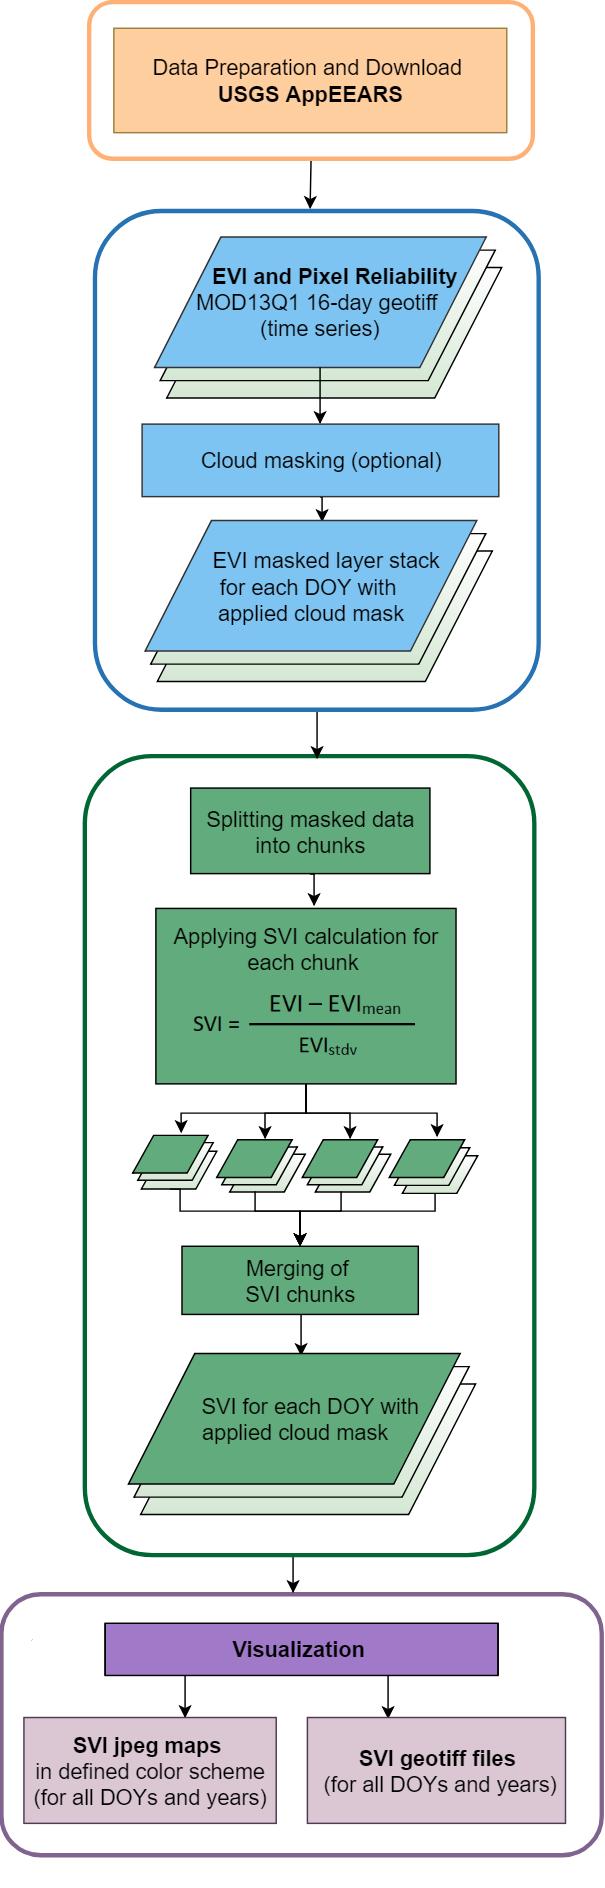 Drought monitoring using the Standardized Vegetation Index (SVI) - R